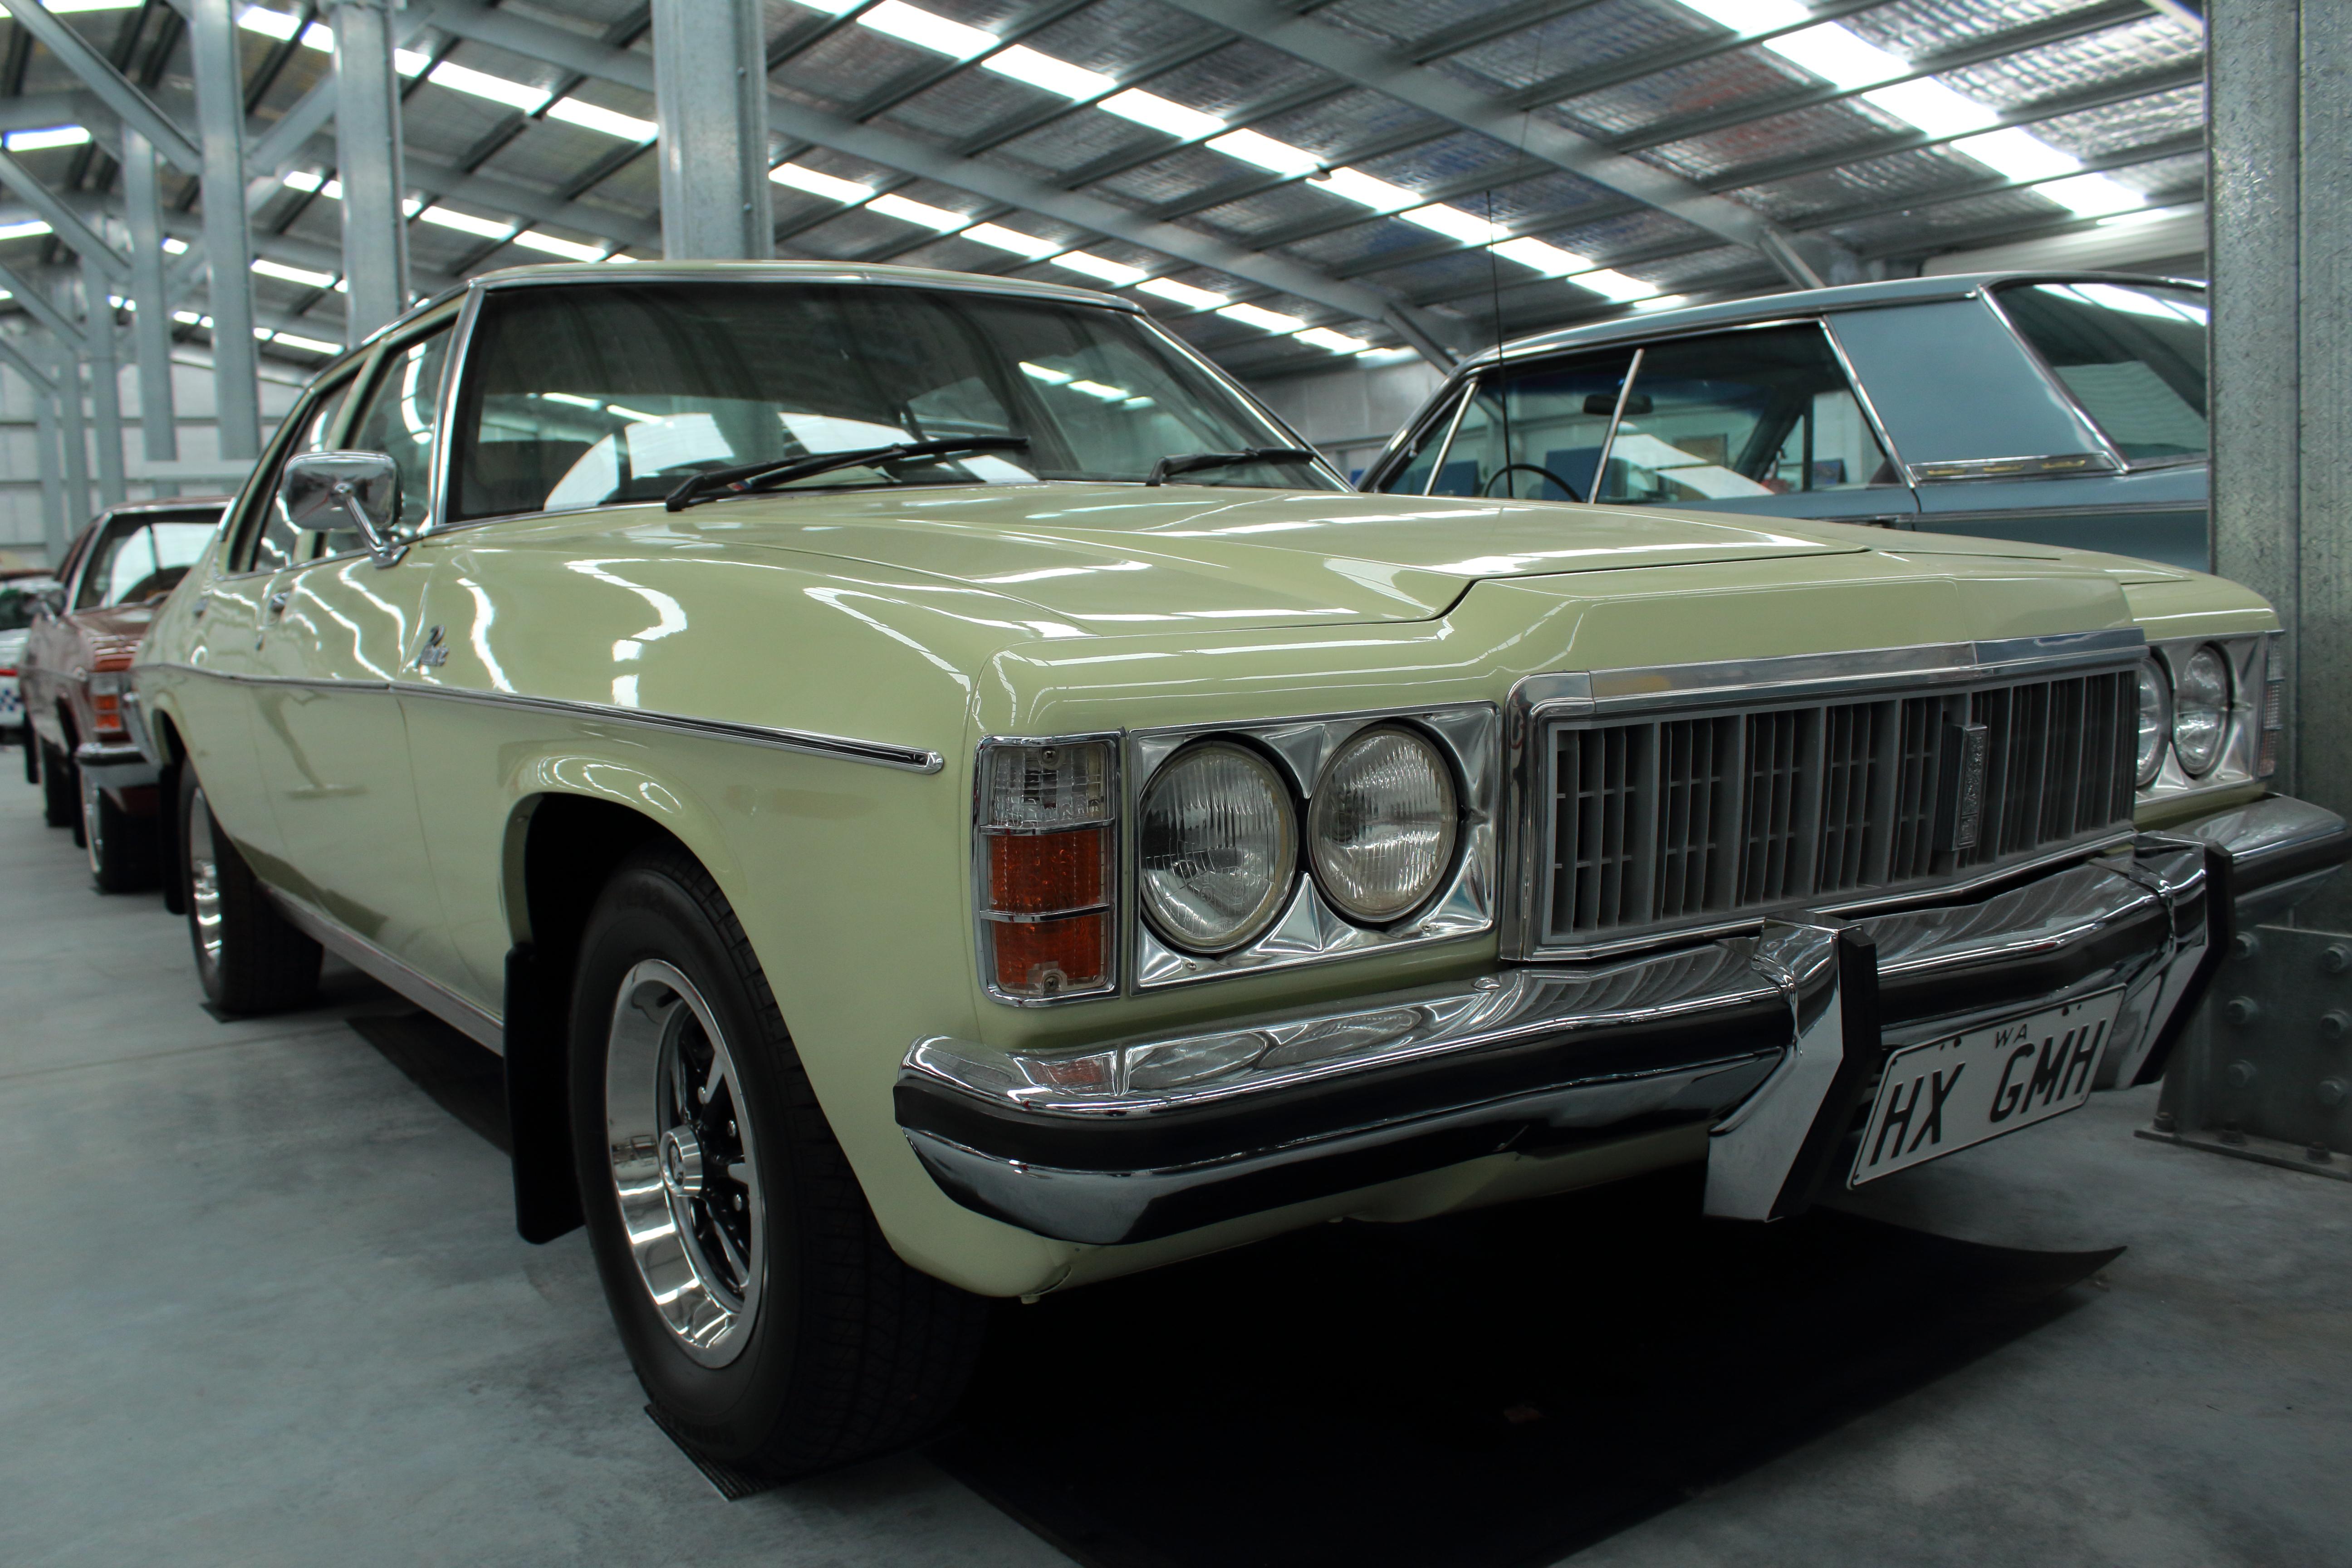 Holden Premier HX Sedan